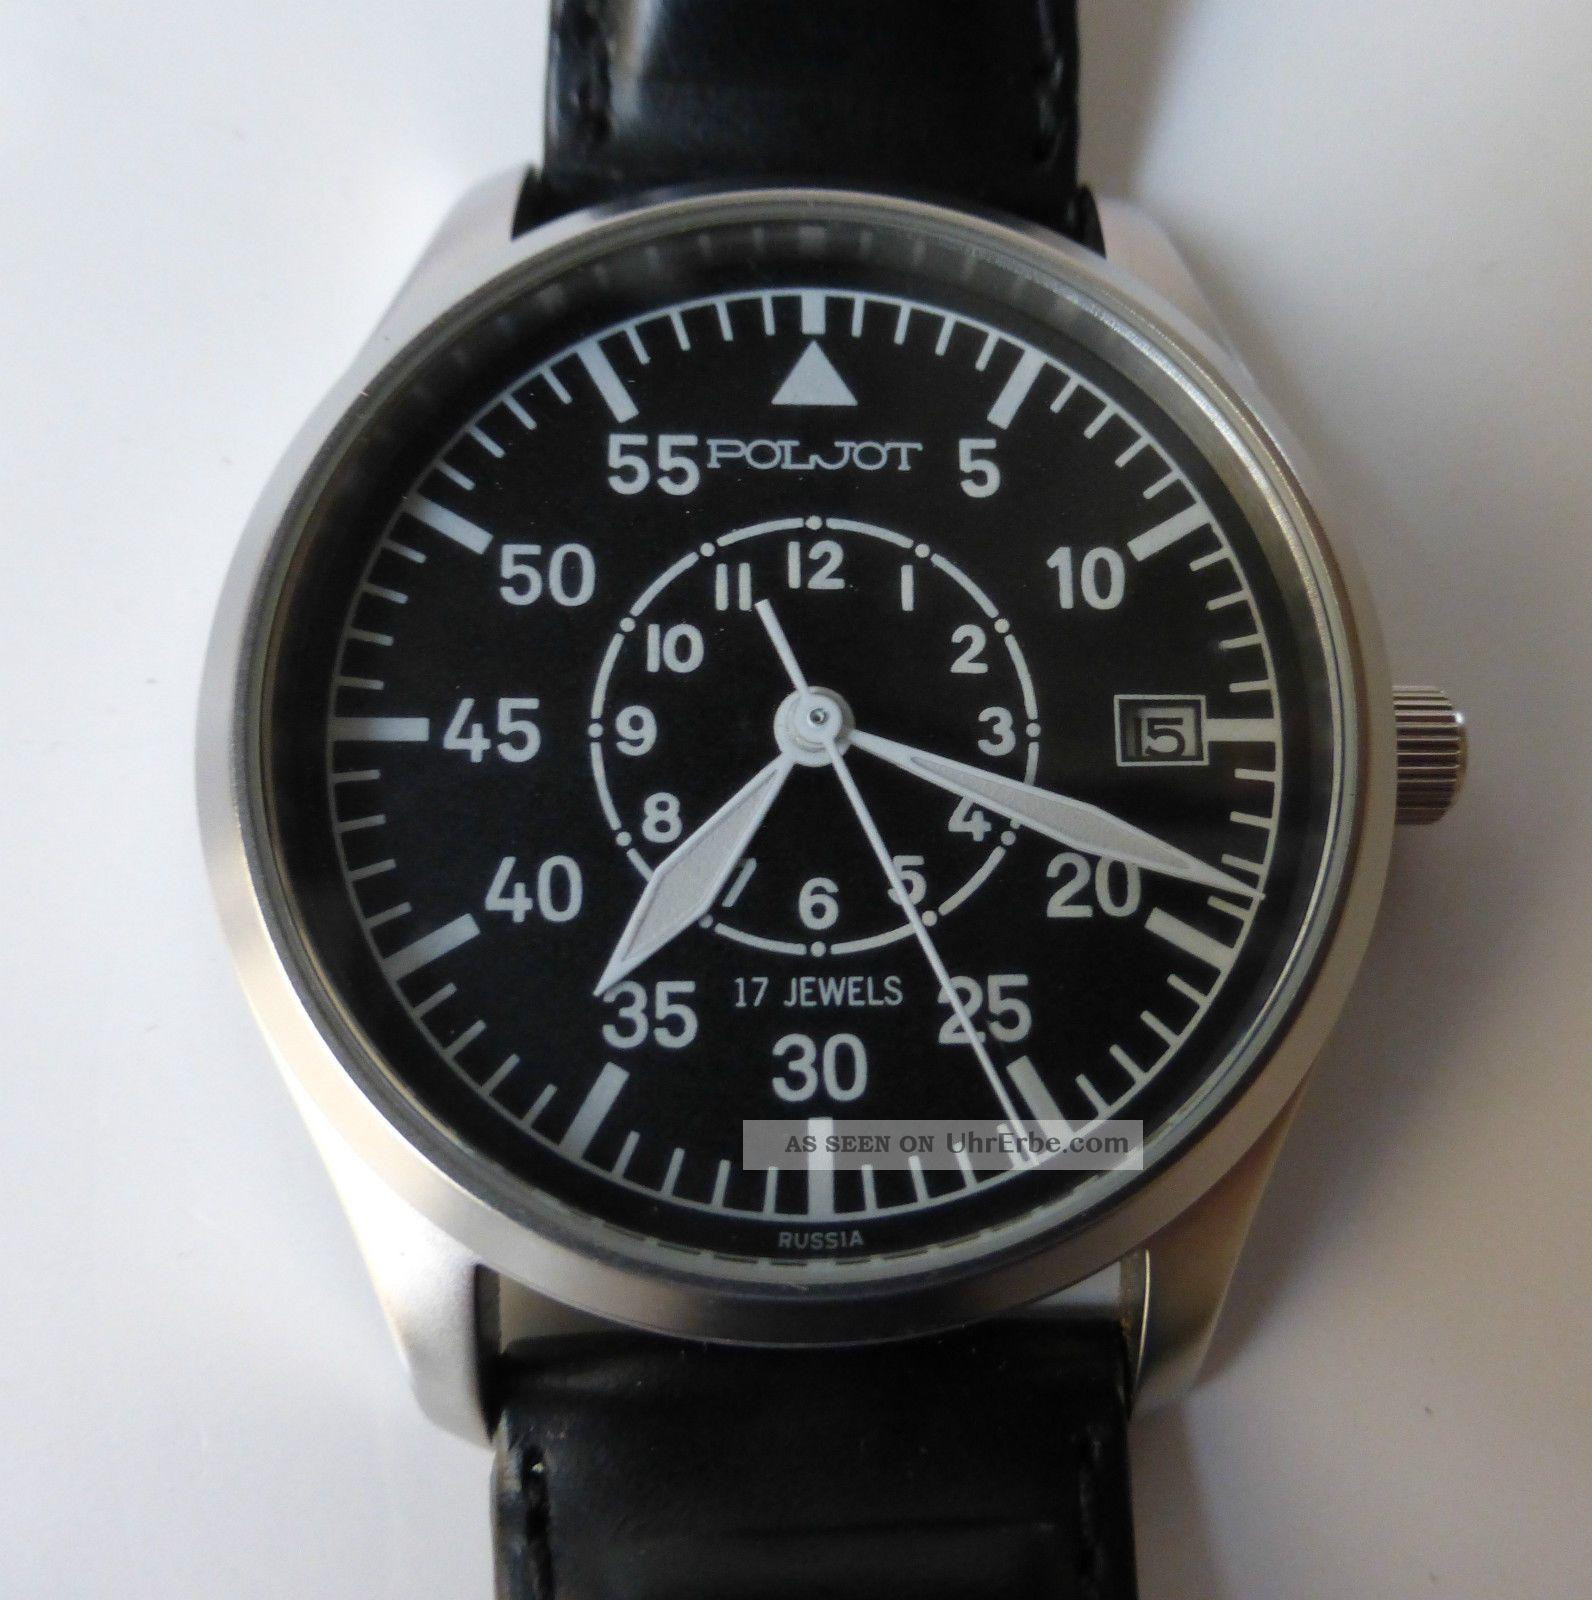 Hau Poljot Uhr Fliegeruhr - Limitierte Sammleruhr - Schöne Herrenuhr Handaufzug Armbanduhren Bild